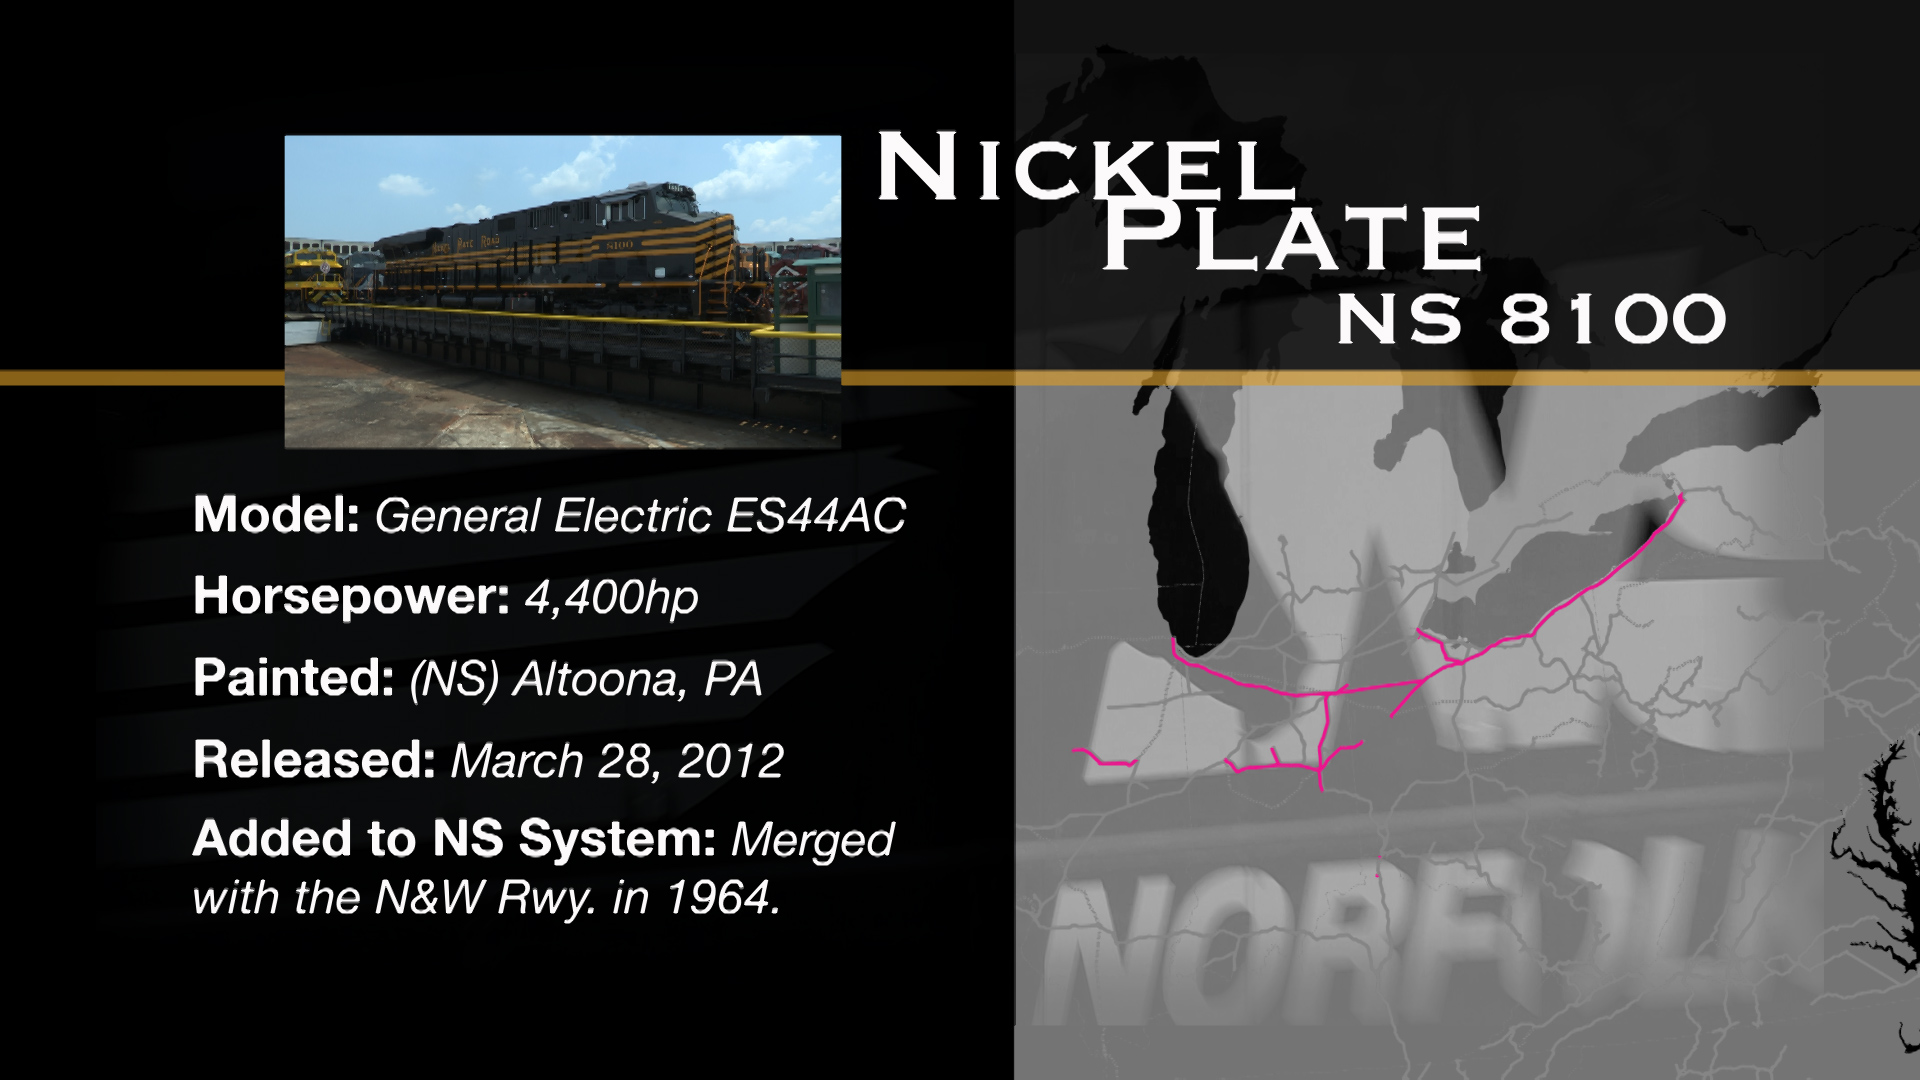 05 - Nickel Plate Intro Graphic.jpg